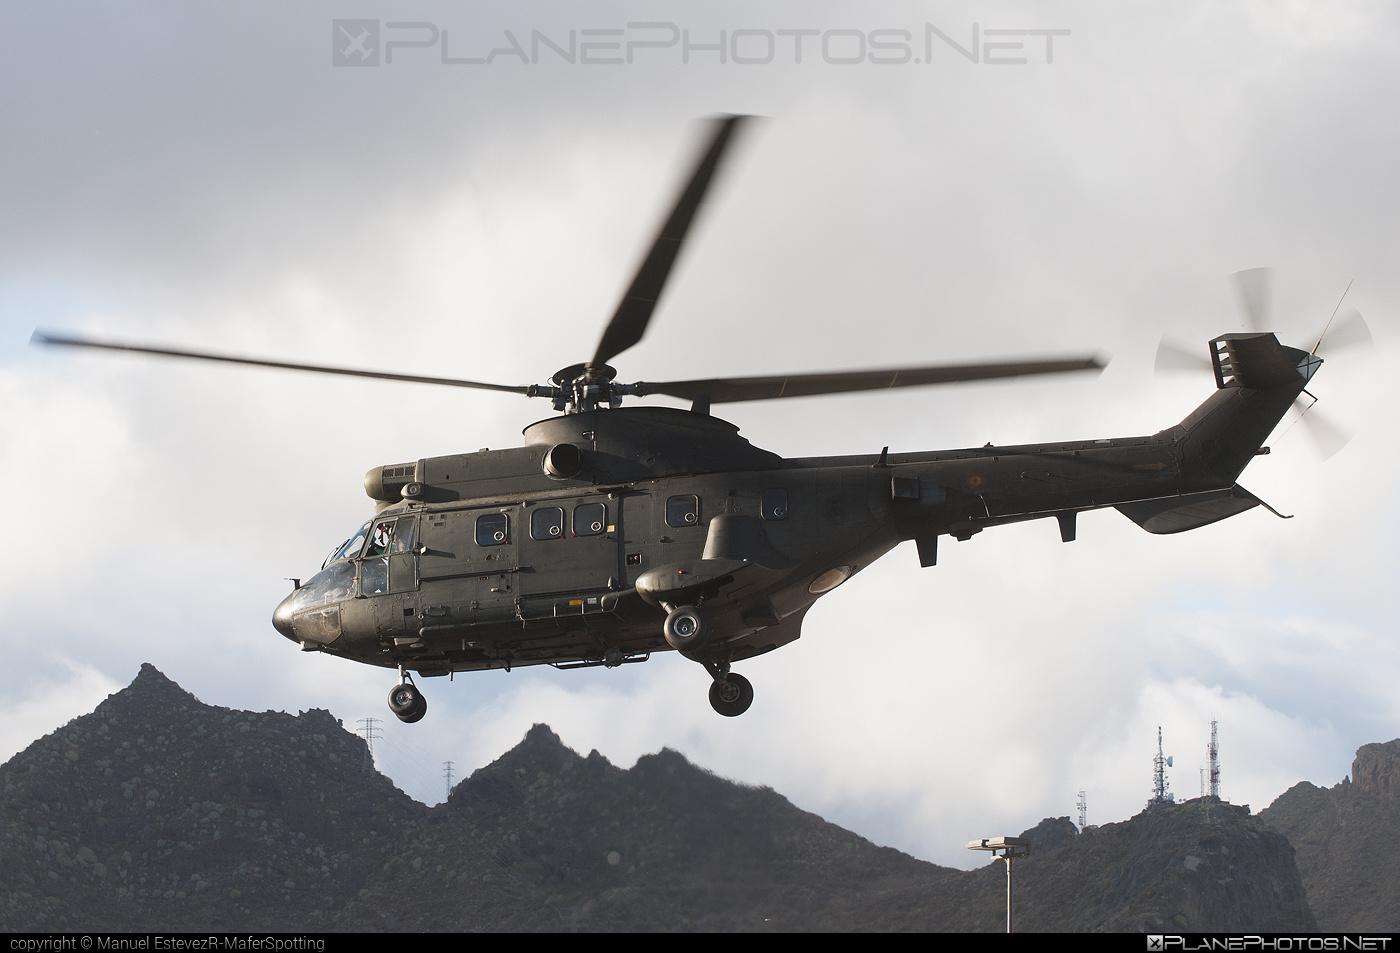 Aerospatiale AS332 B1 Super Puma - HU.21-05 operated by Ejército de Tierra (Spanish Army) #aerospatiale #as332 #as332b1 #superpuma